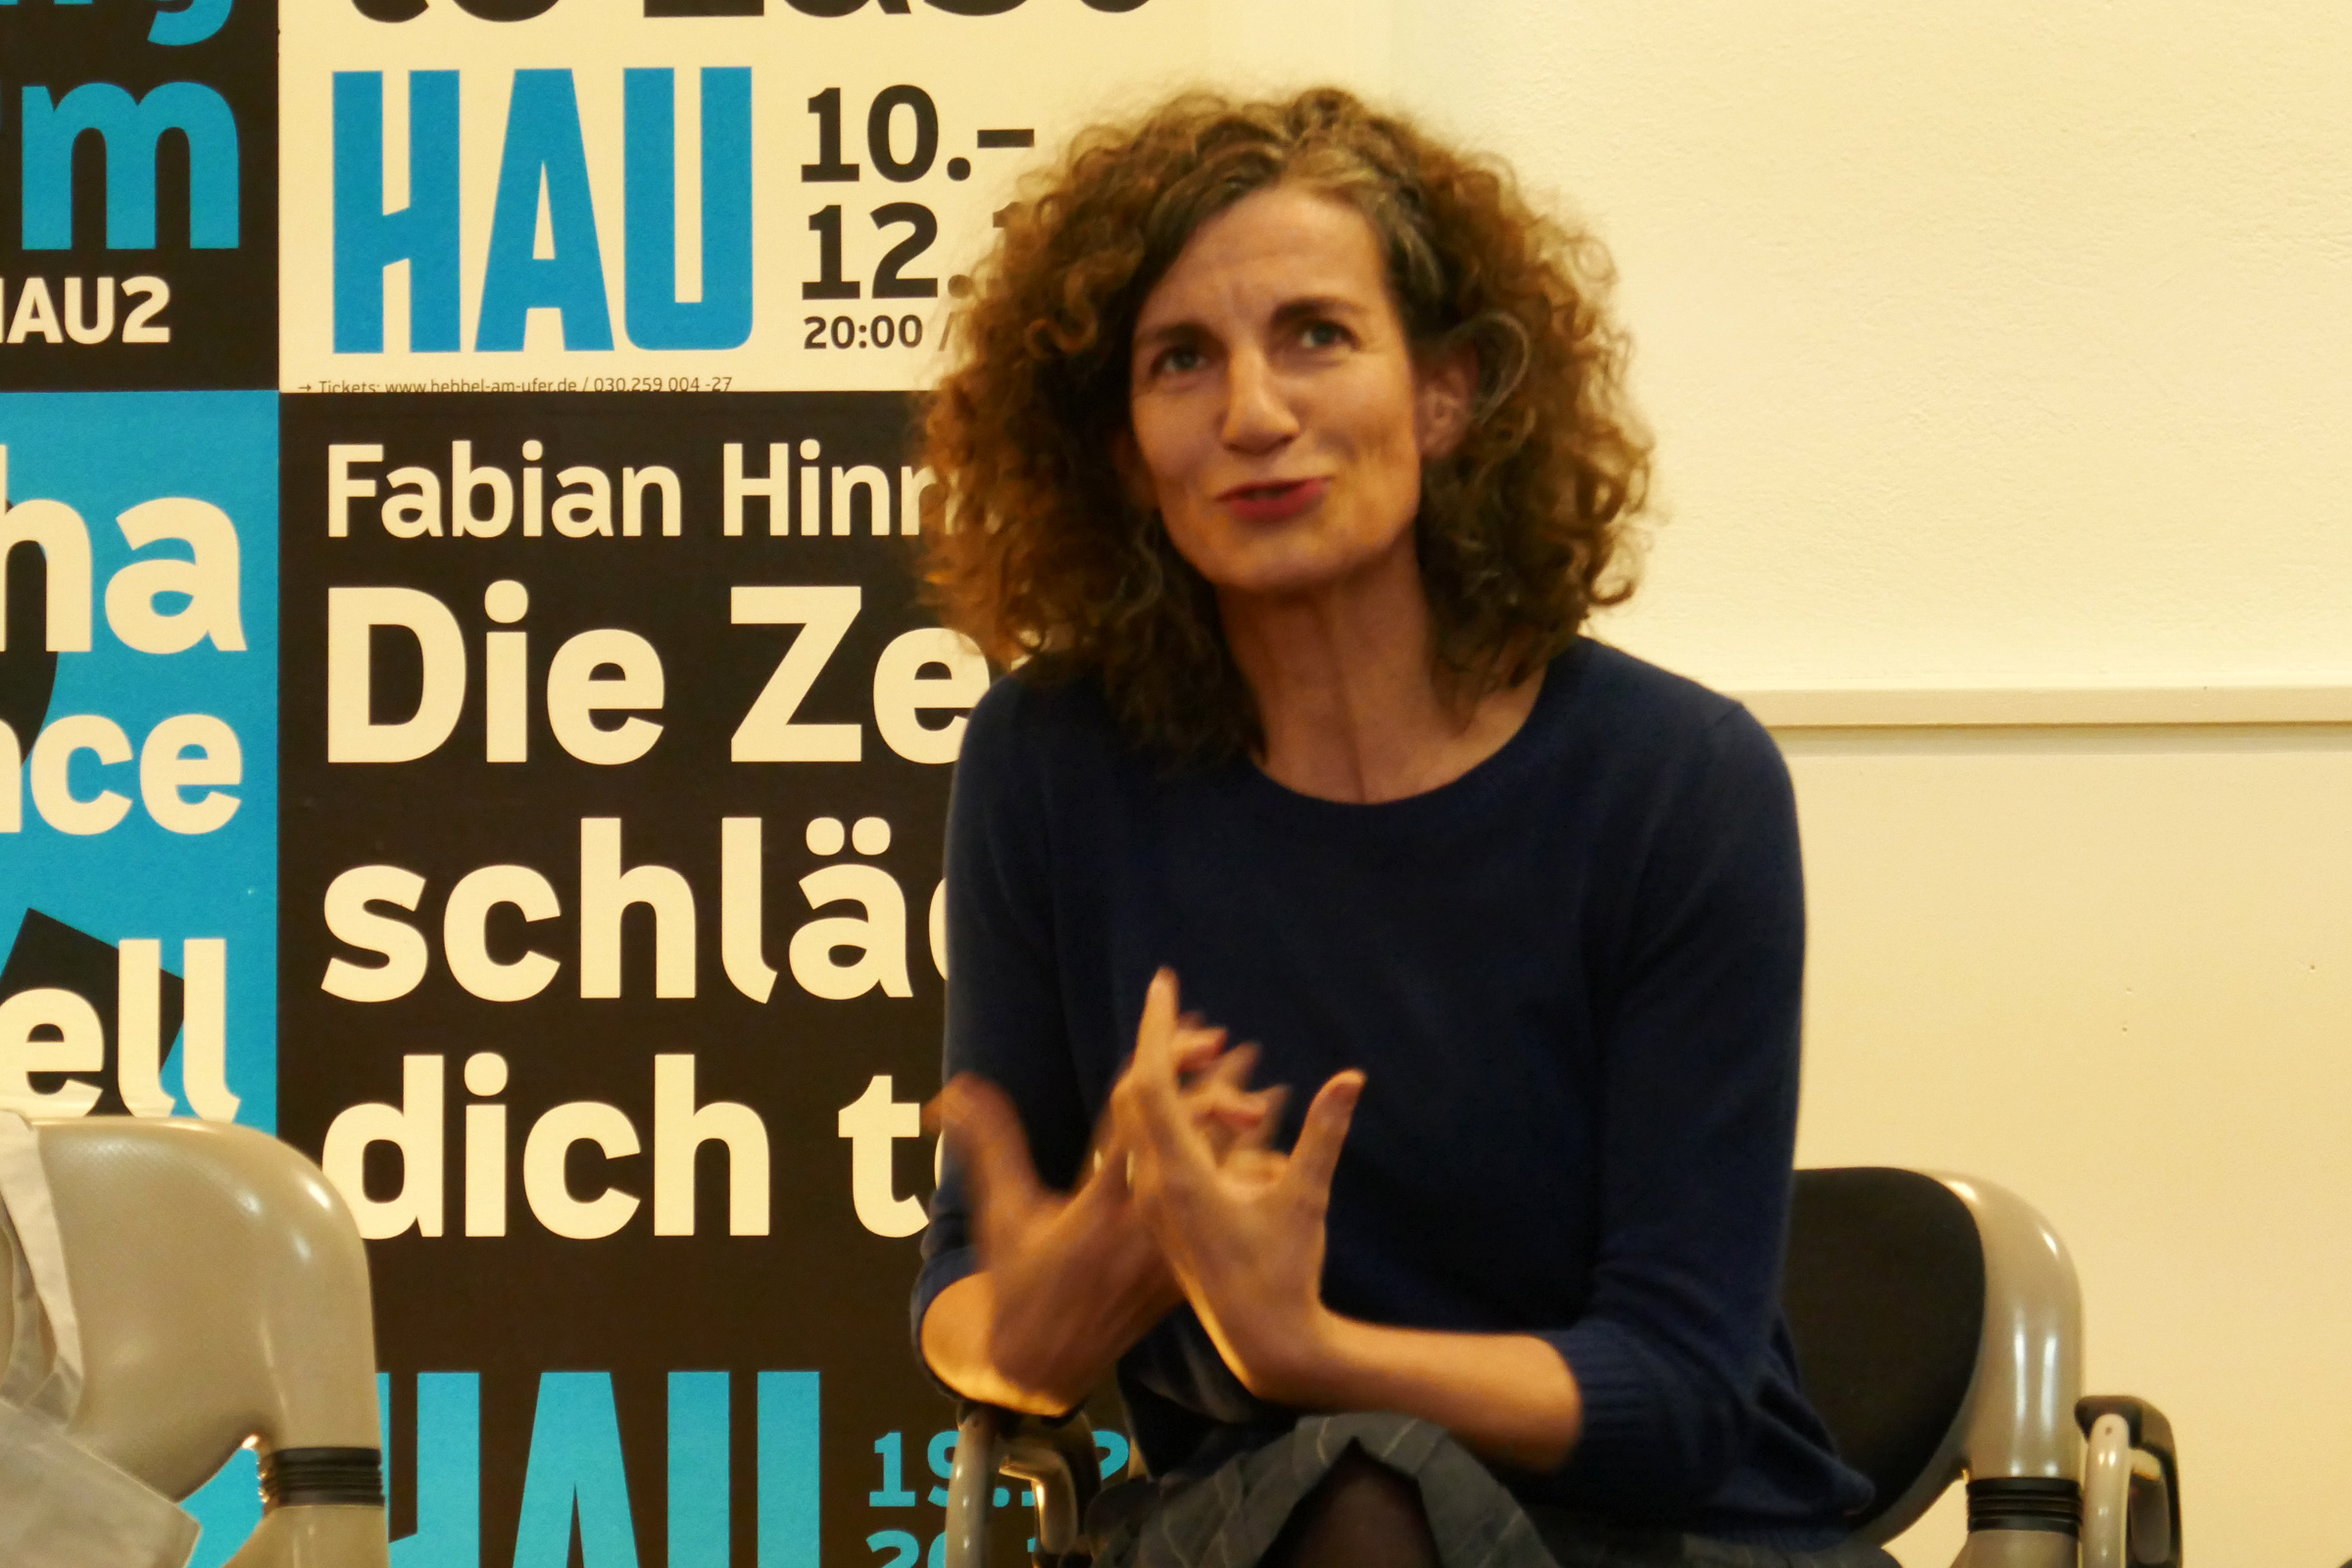 HAU-Intendantin Annemie Vanackere. Foto: Ulrich Horb